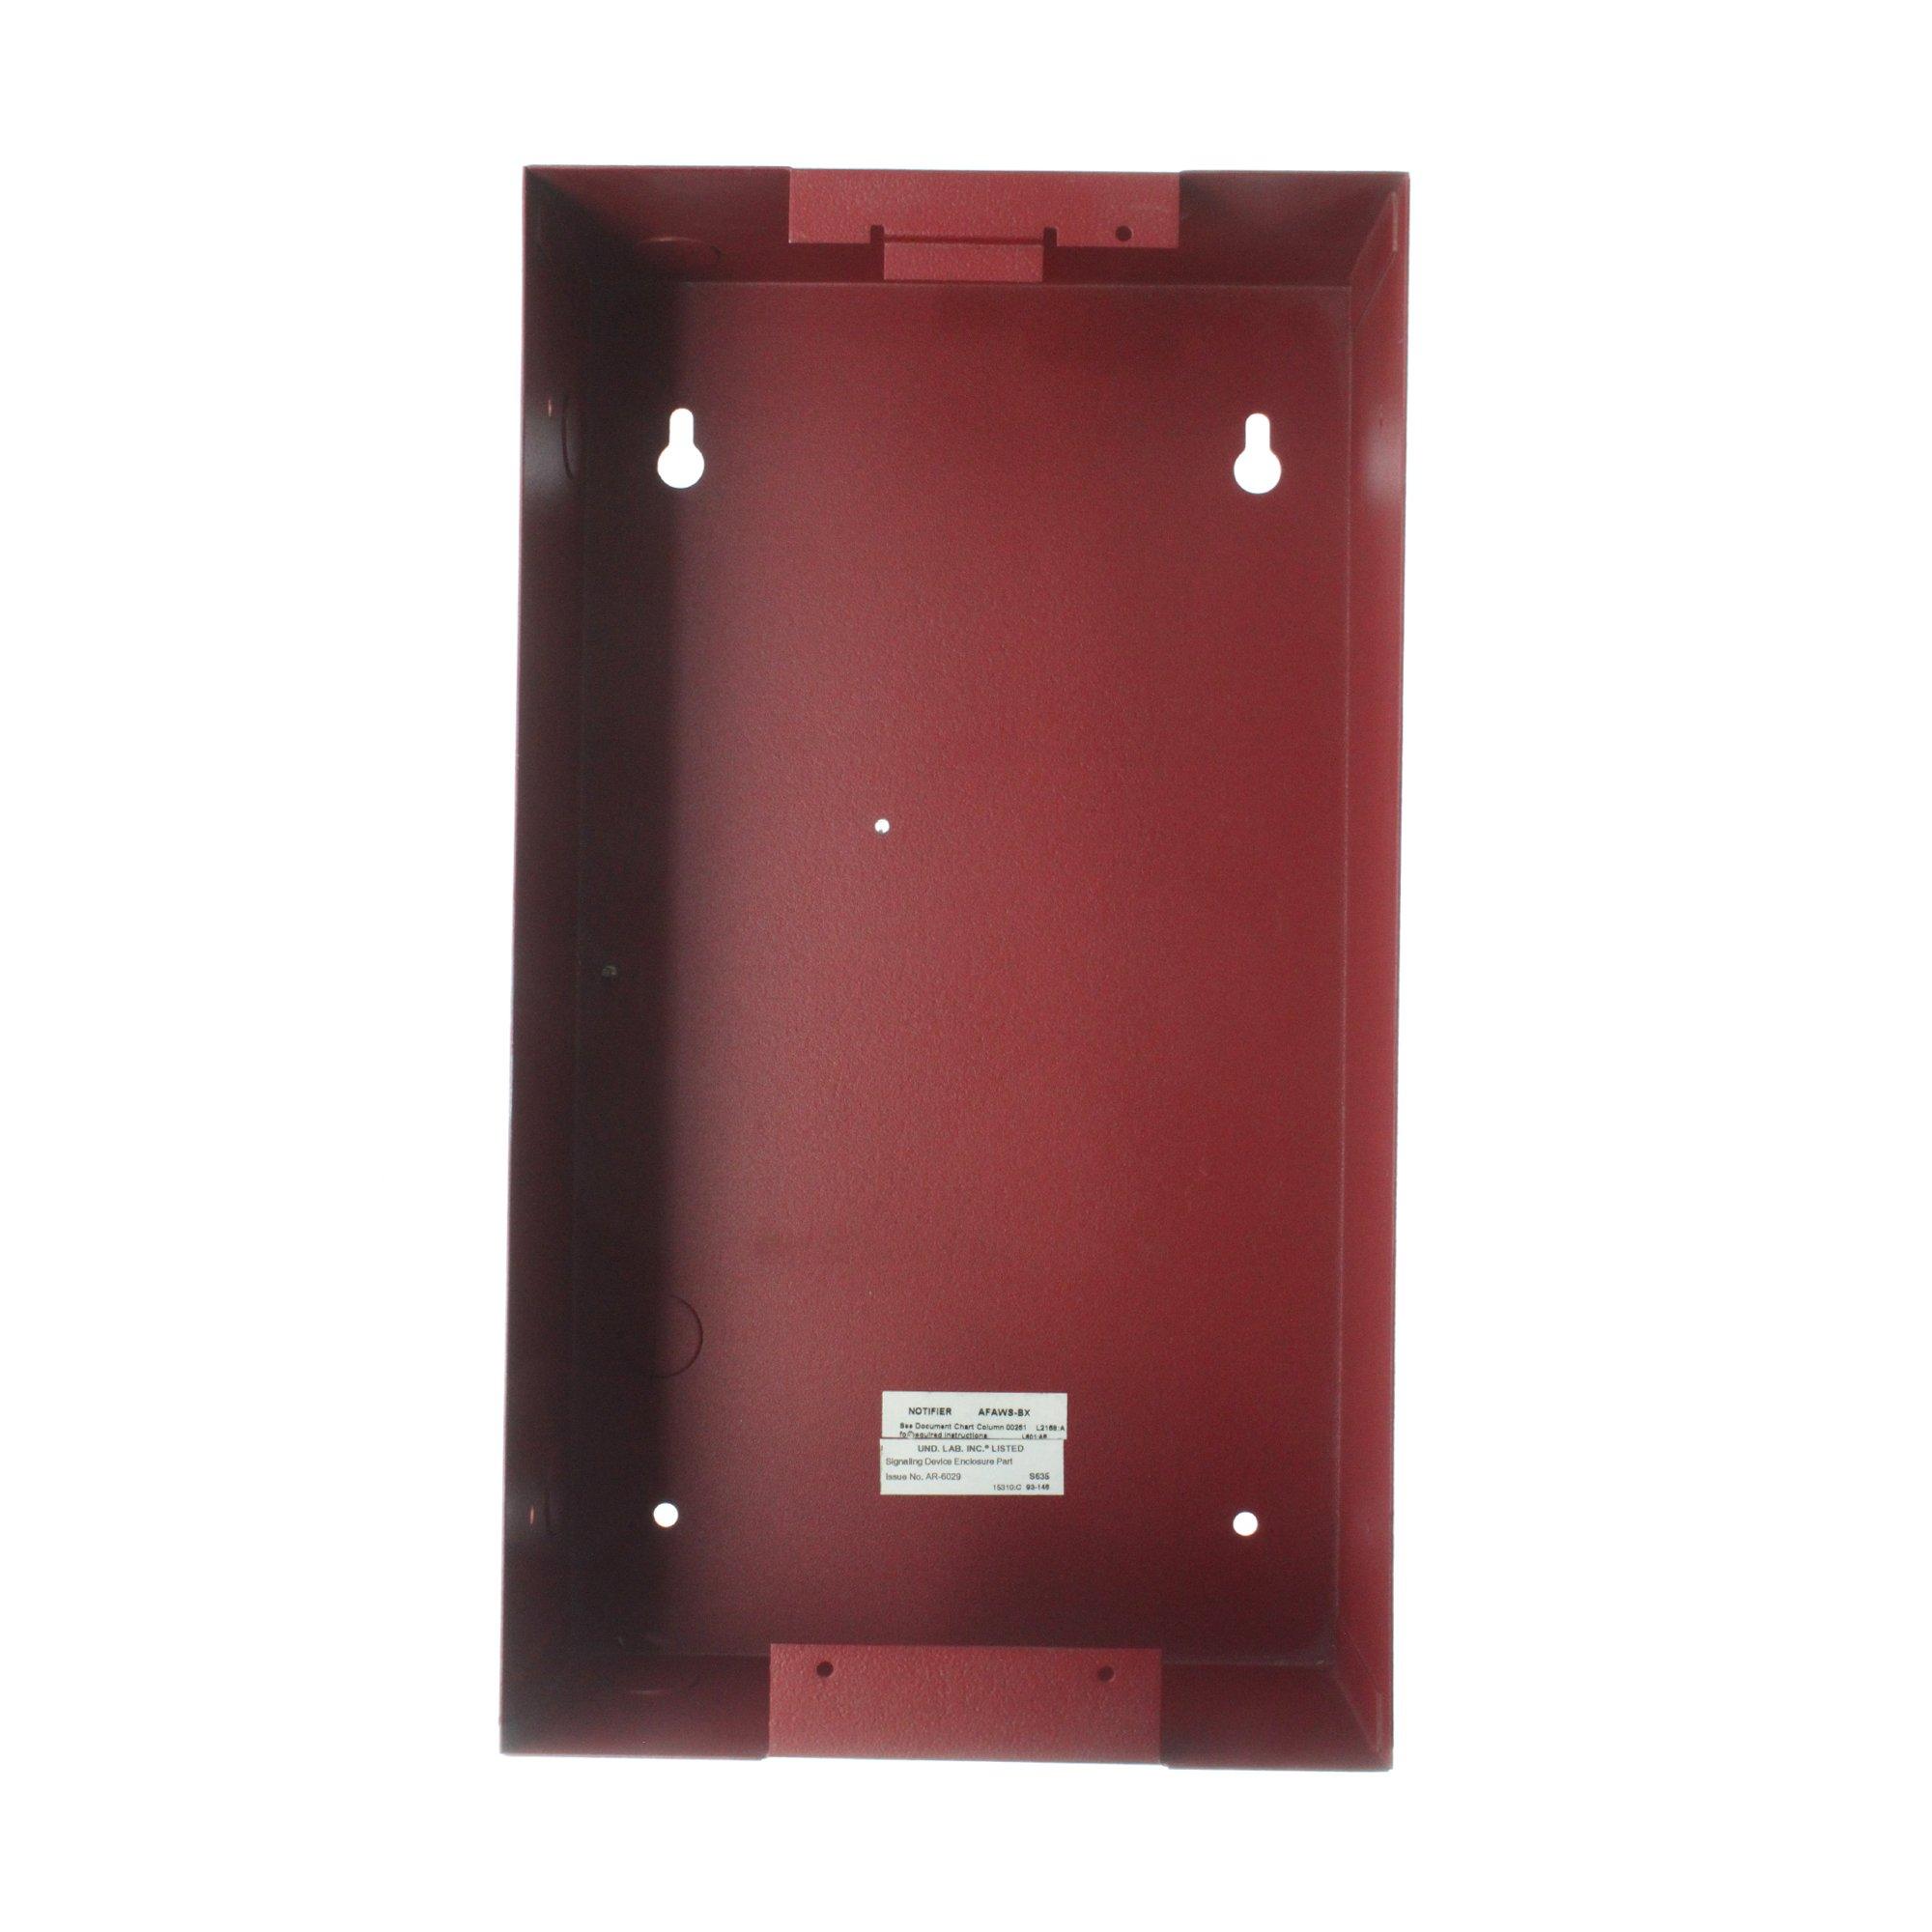 Notifier AFAWS-BX Flush Mount Telephone Back Box Alarm Accessory